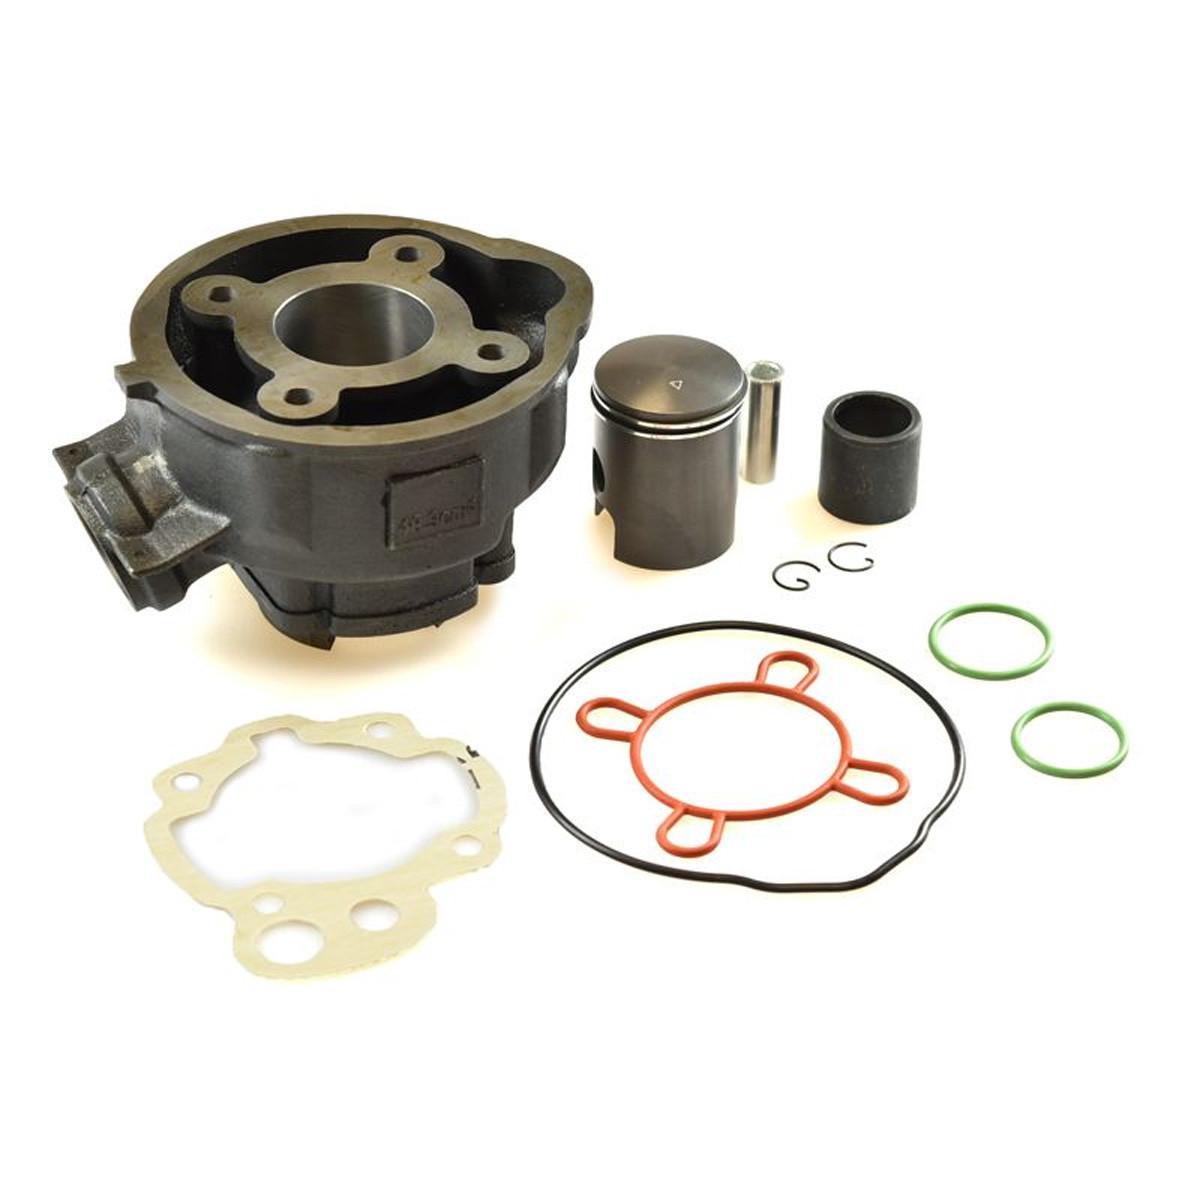 Cylindre 50cc AM6 - Fonte KUNDO